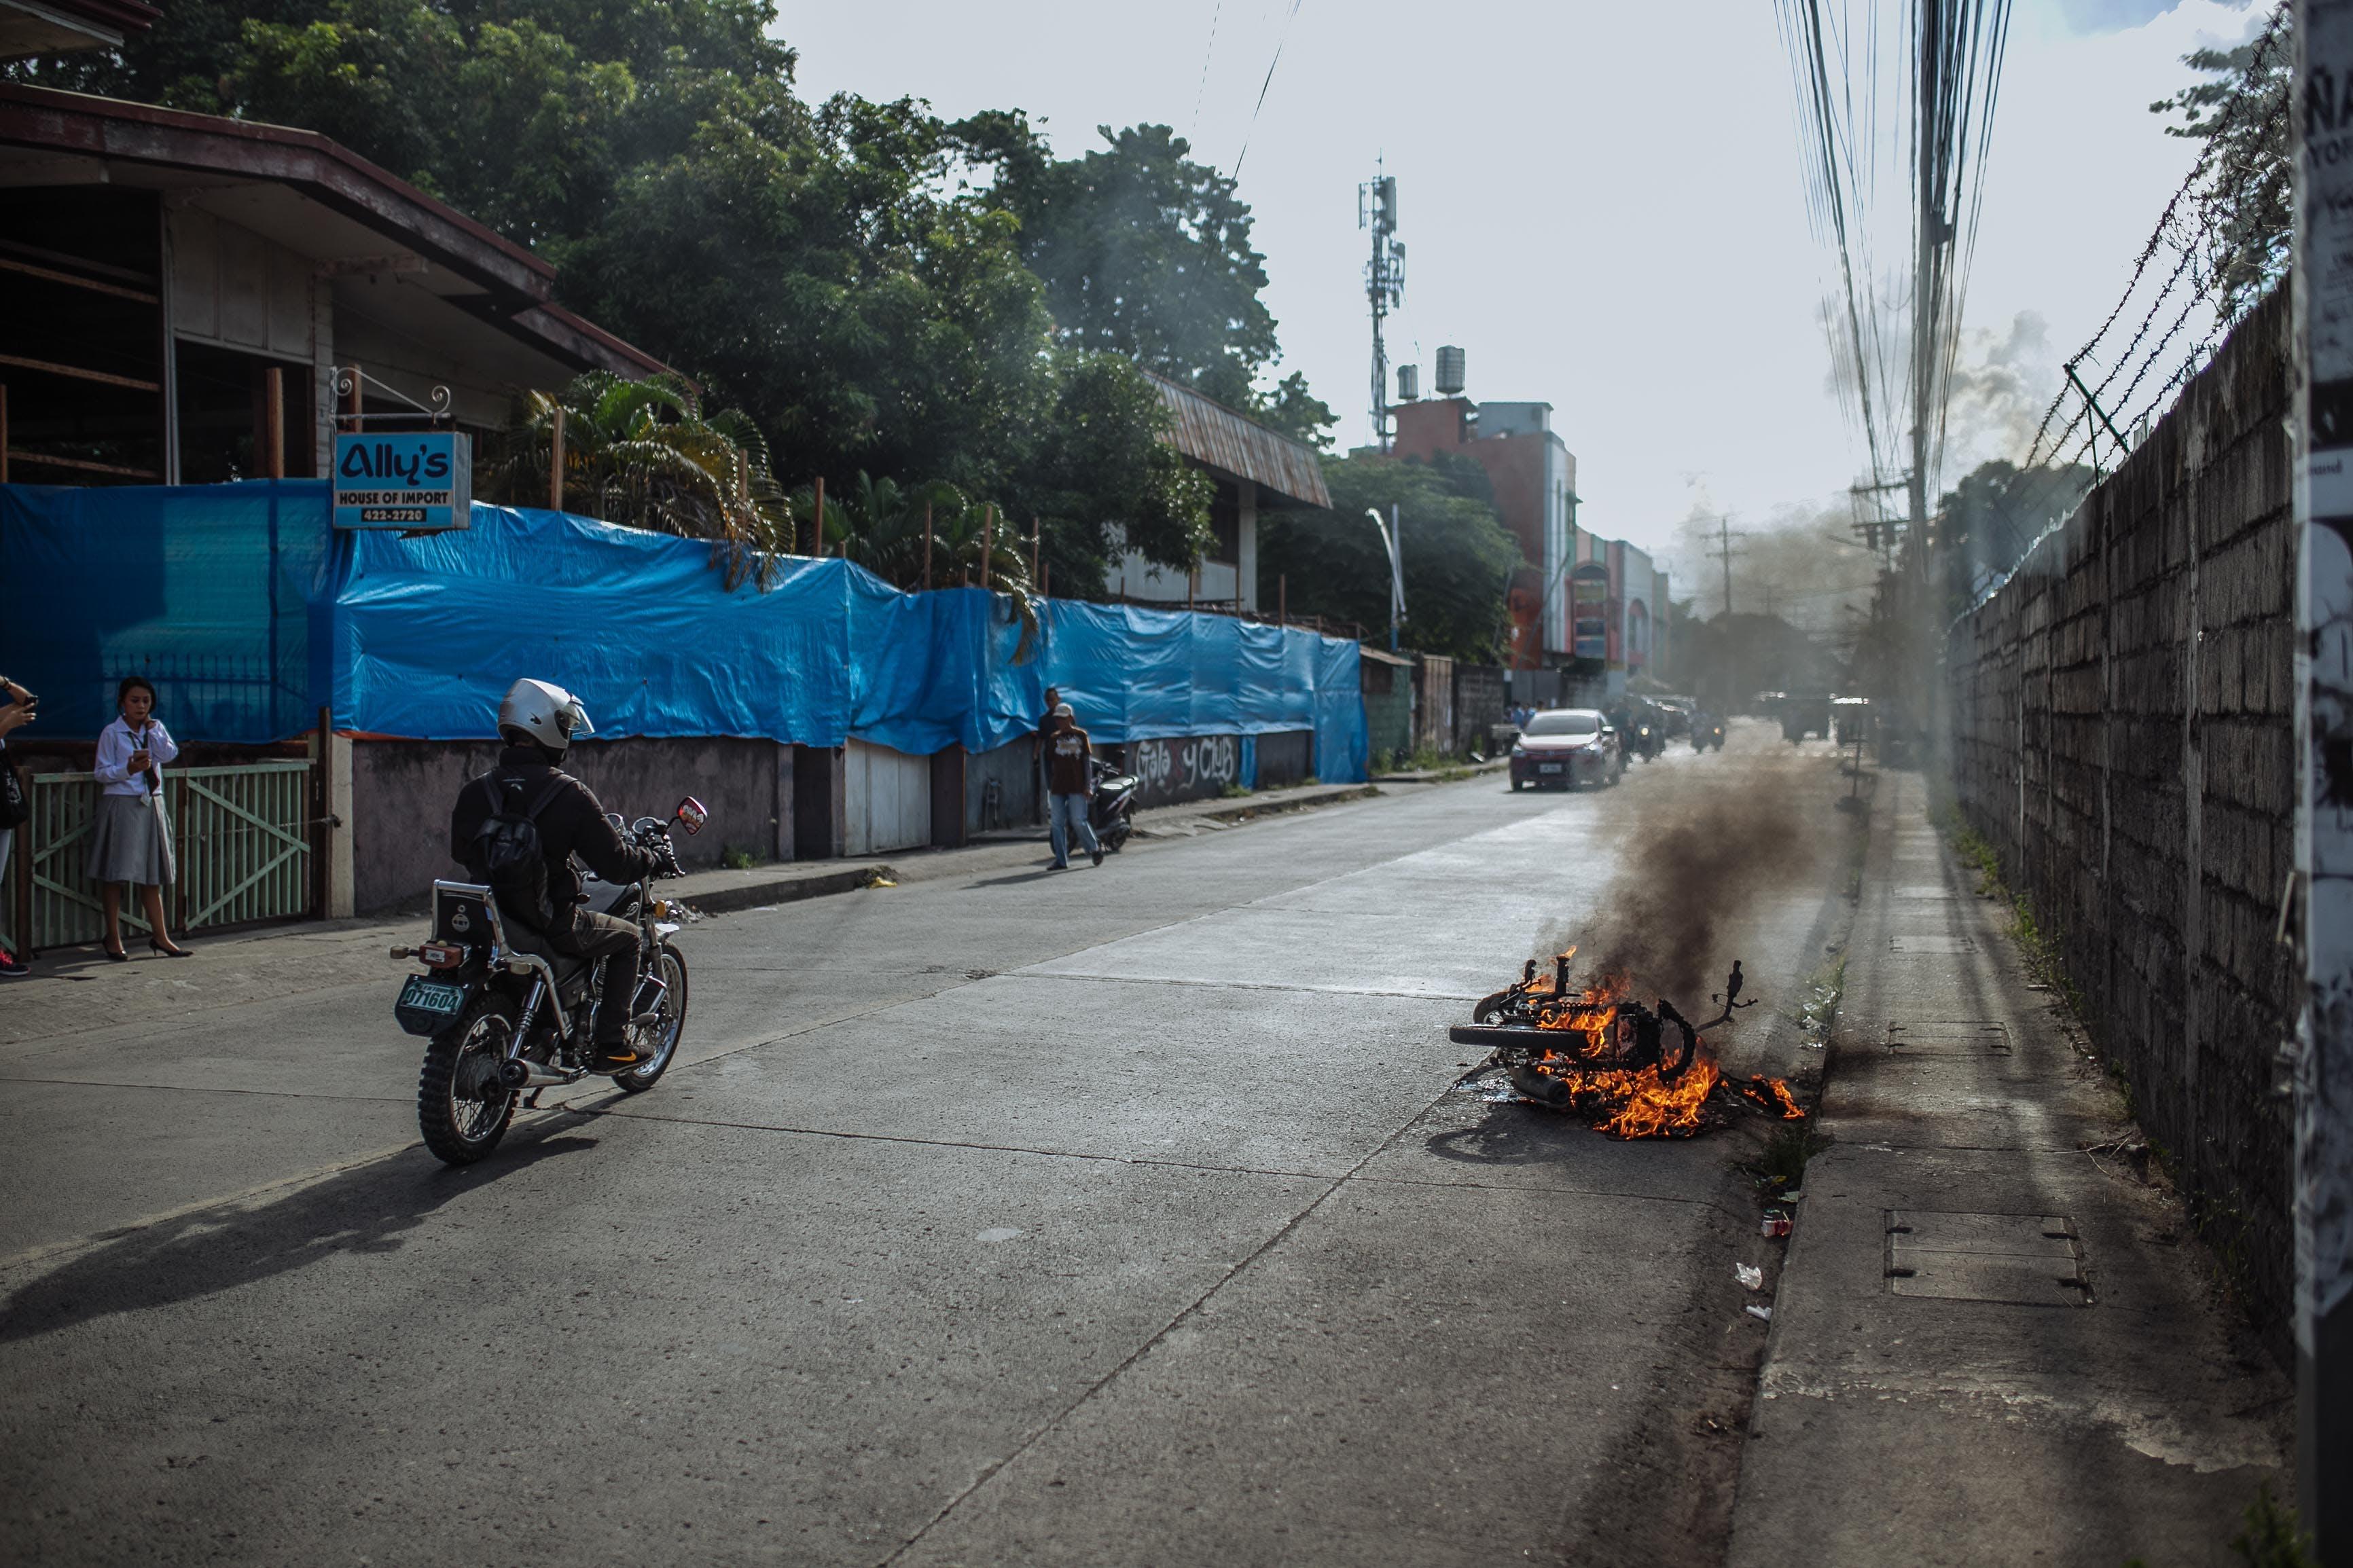 Free stock photo of daily news, fire, motorbike